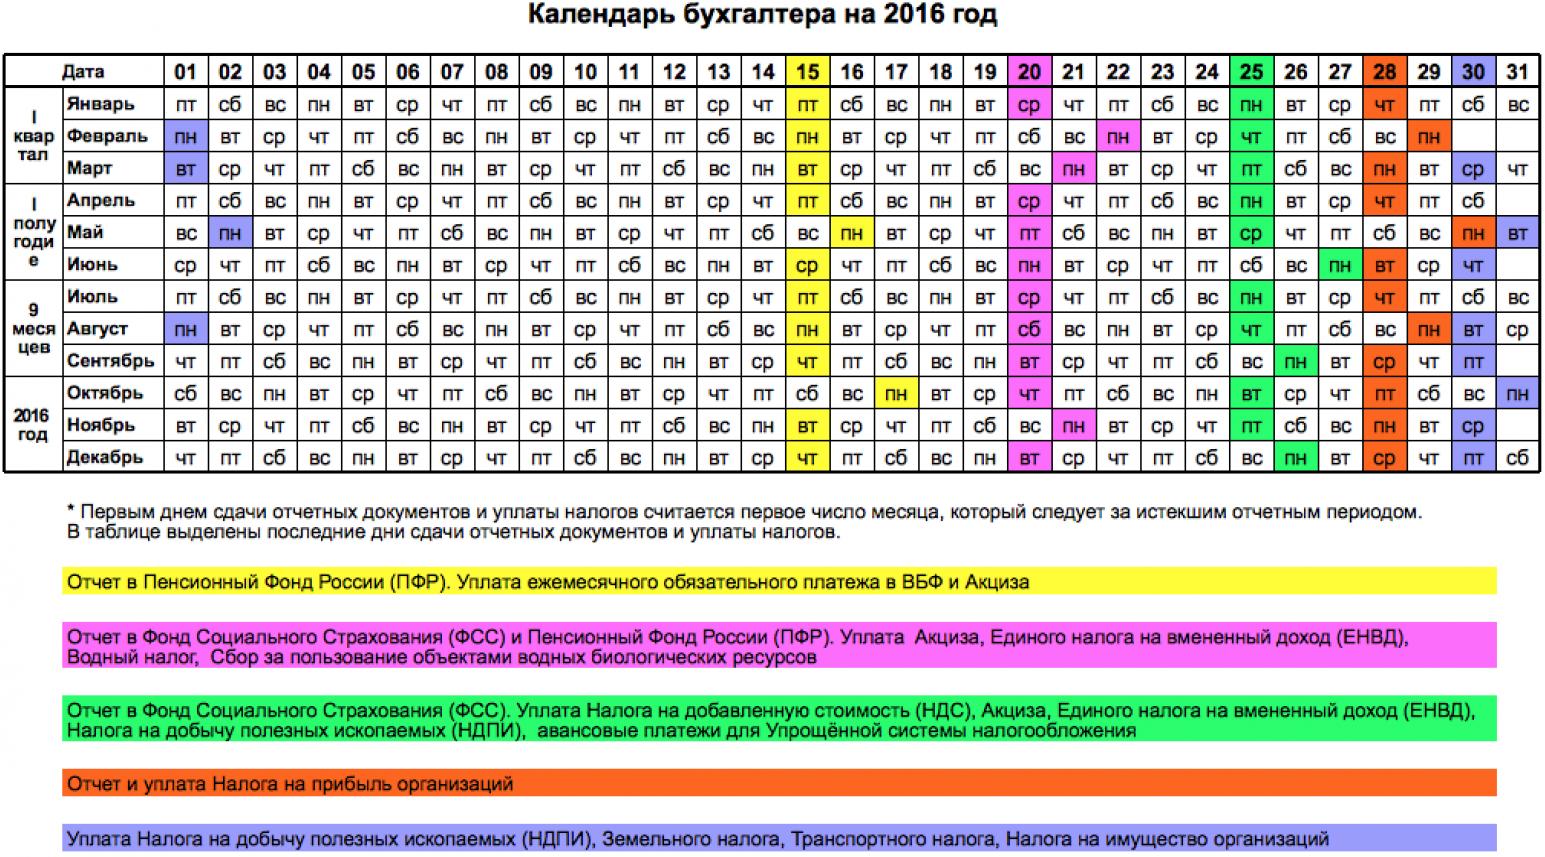 Календарь бухгалтера на 2016 год